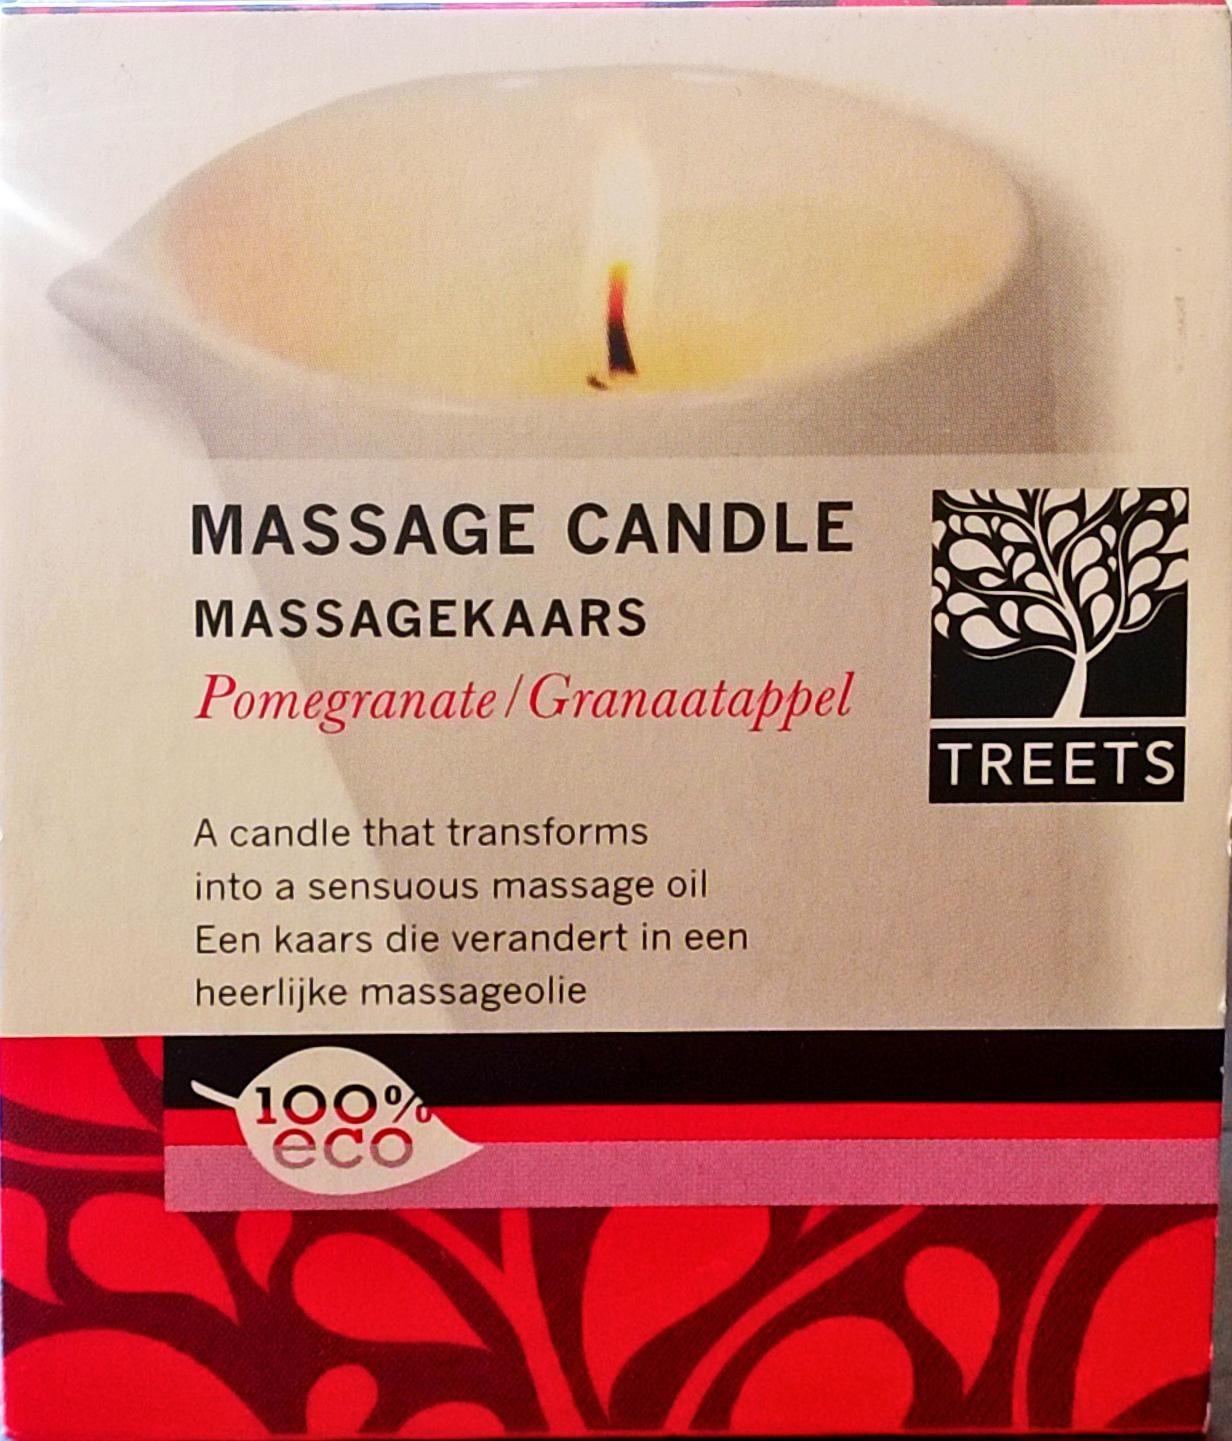 MassageKaars Granaatappel